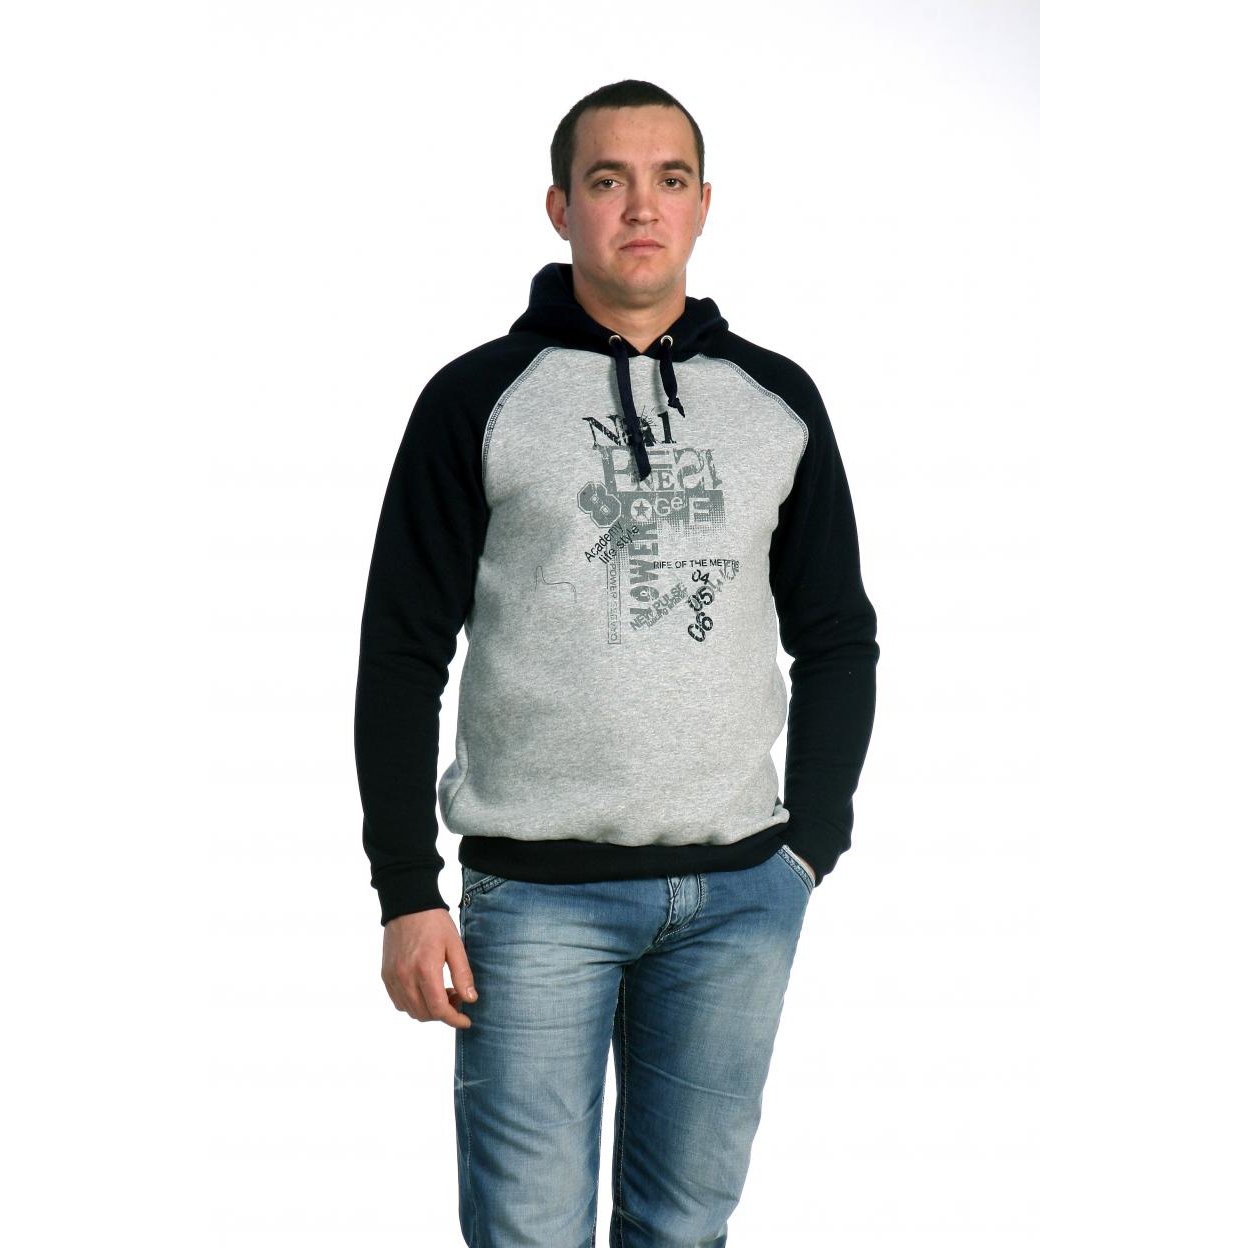 Мужская толстовка «Эван», размер 58Толстовки, джемпера и рубашки<br>Обхват груди:116 см<br>Обхват талии:108 см<br>Обхват бедер:114 см<br>Рост:178-188 см<br><br>Тип: Муж. толстовка<br>Размер: 58<br>Материал: Футер